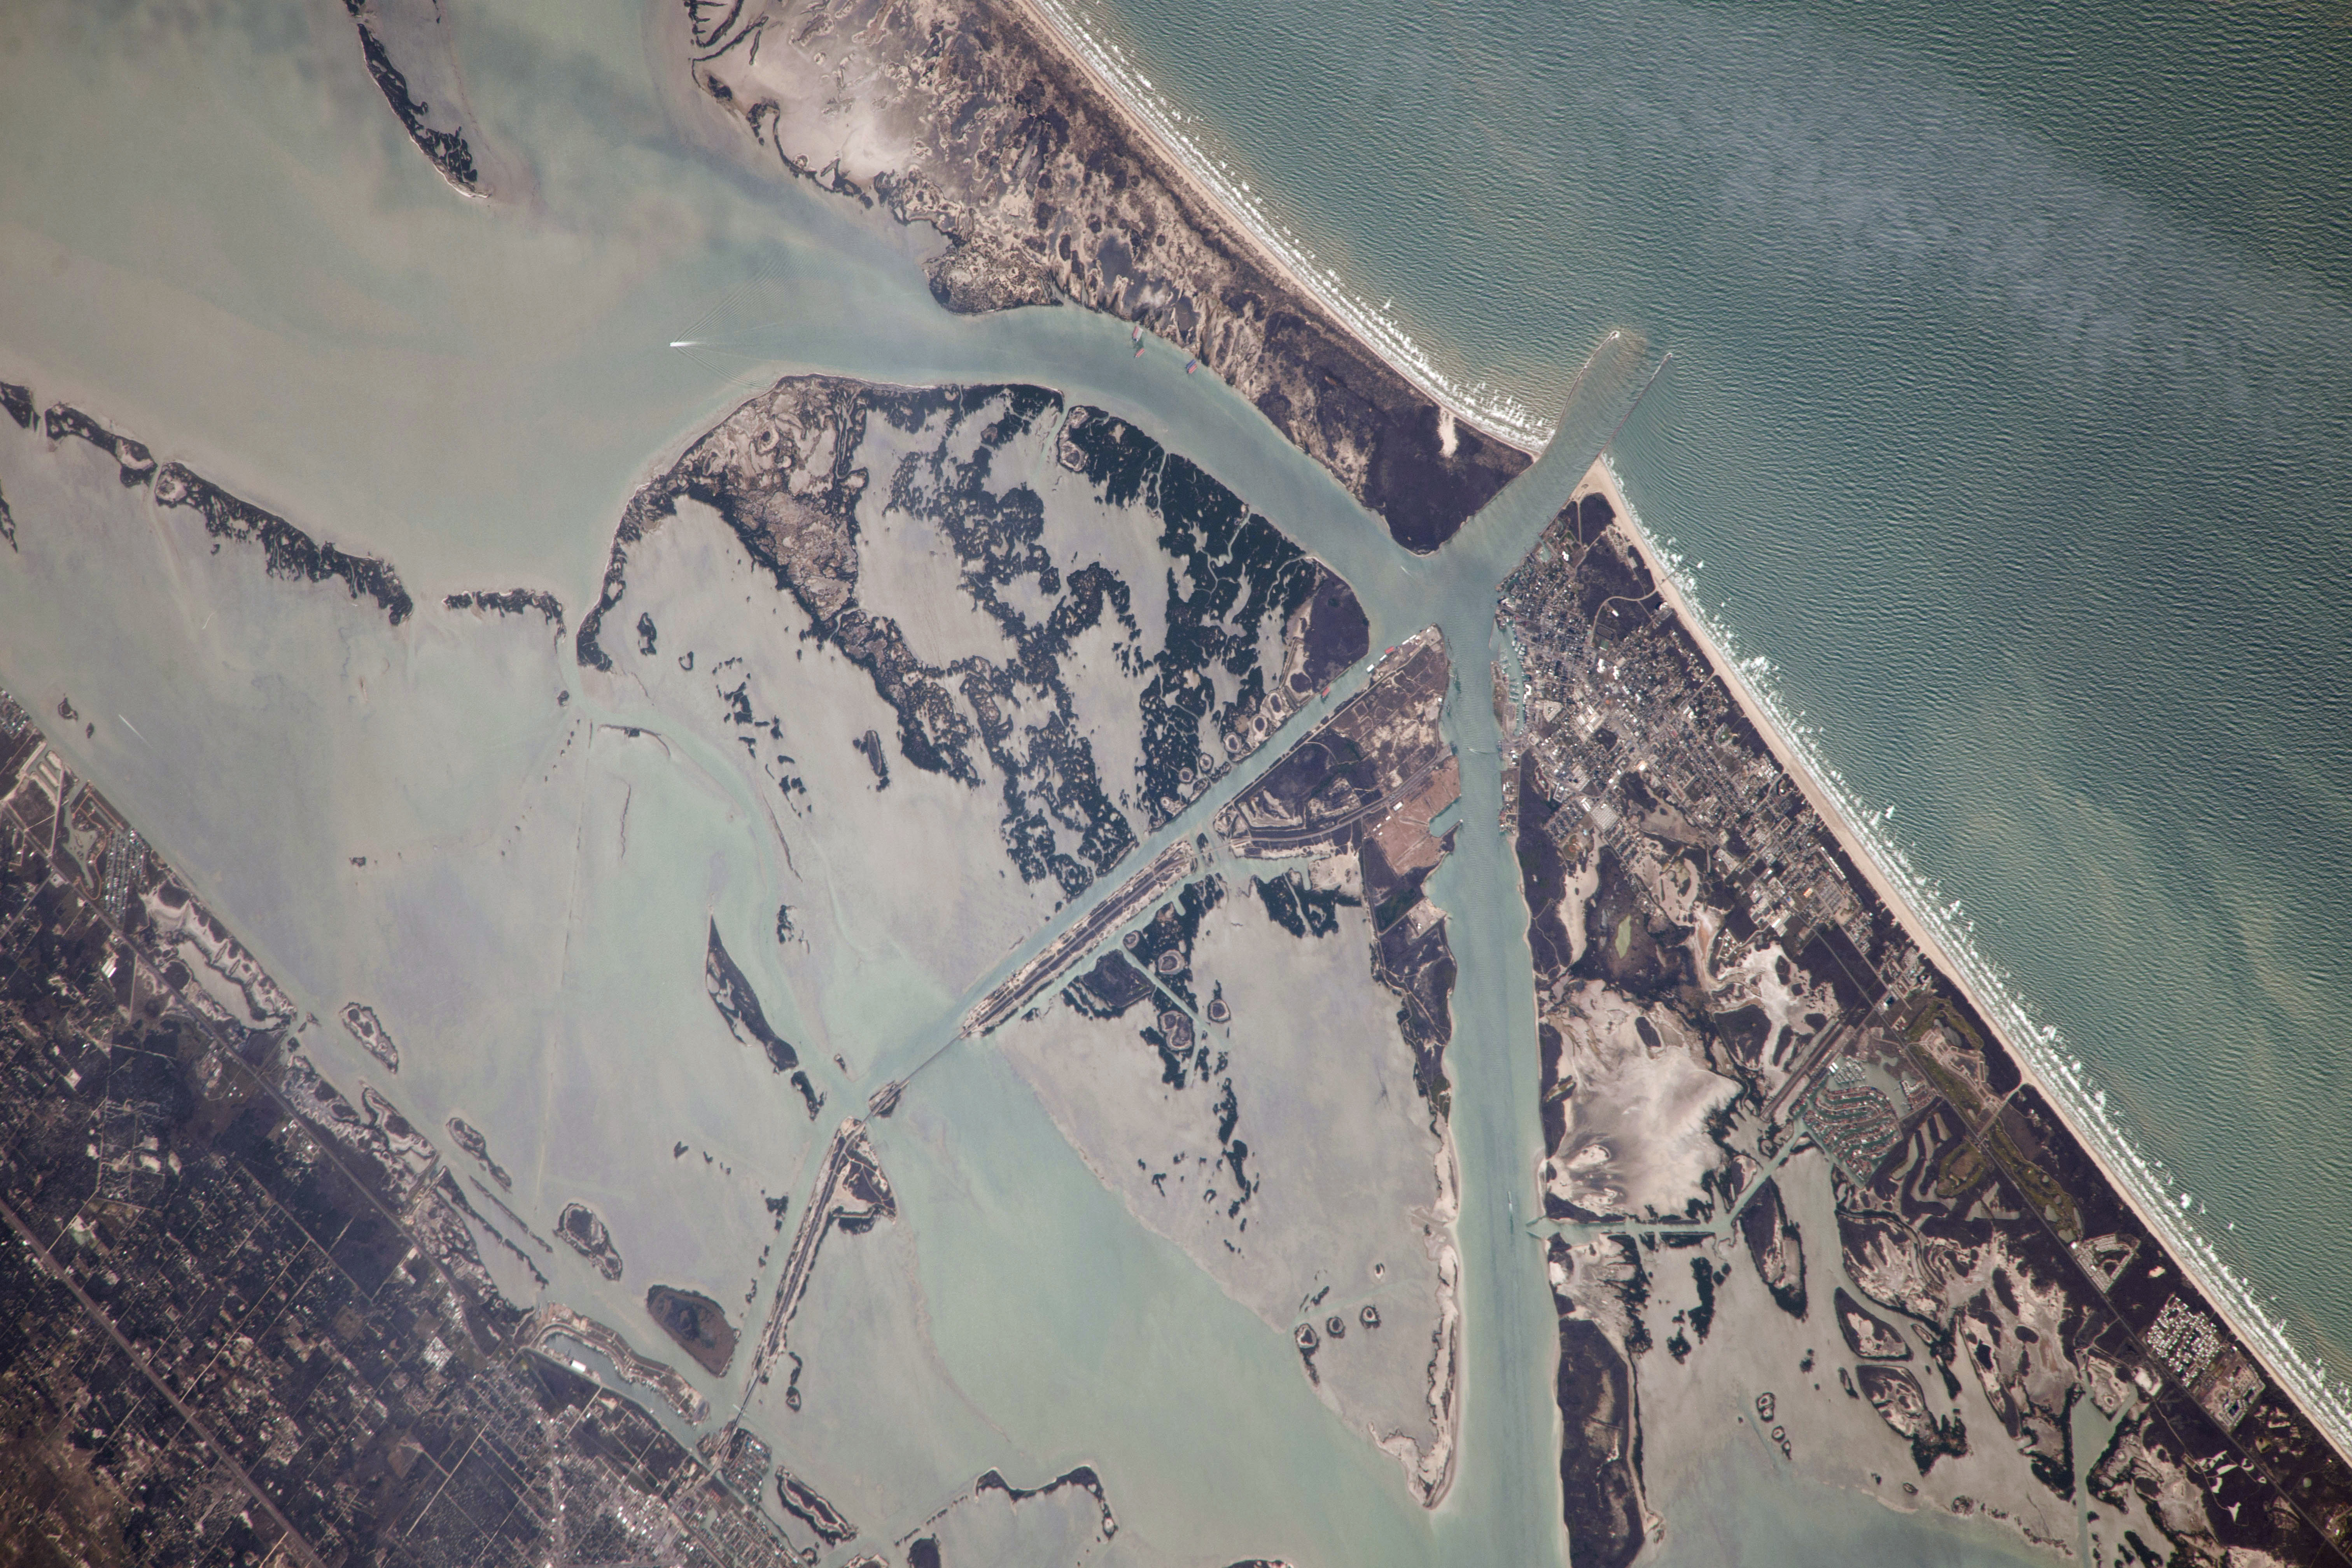 File:ISS-38 Intracoastal Waterway in southern Texas jpg - Wikimedia